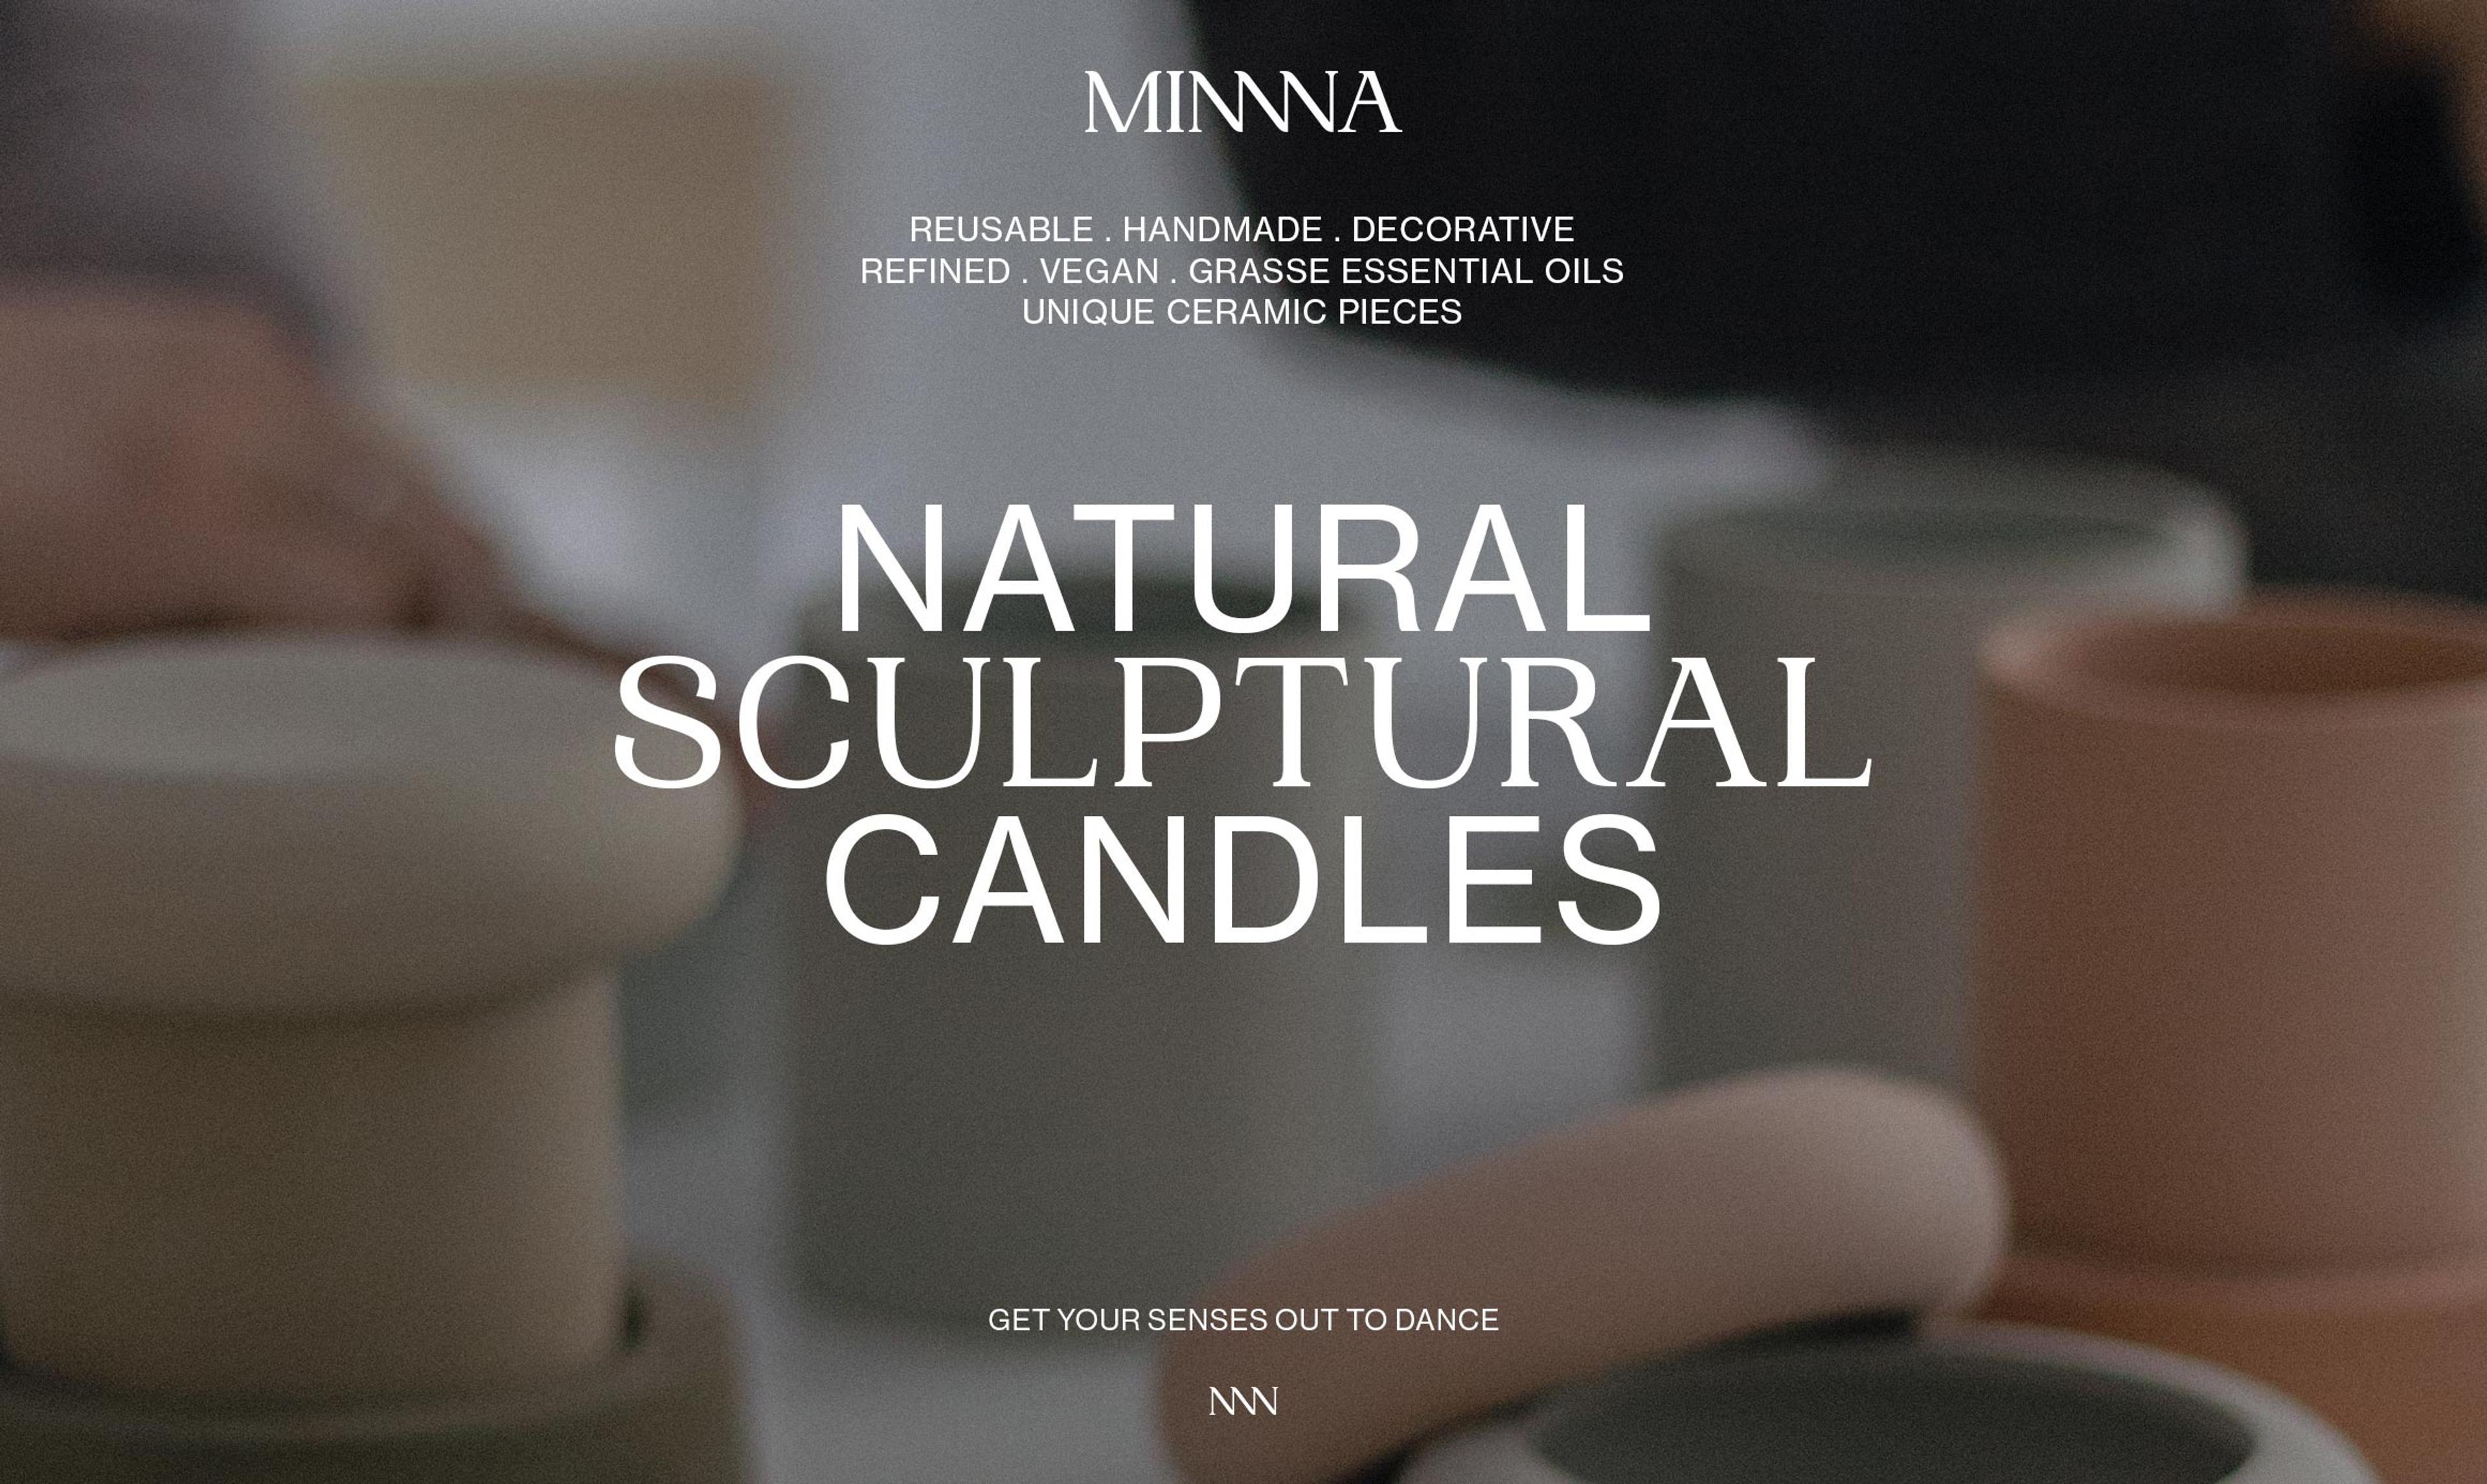 Minnna Candles by Blavet Studio